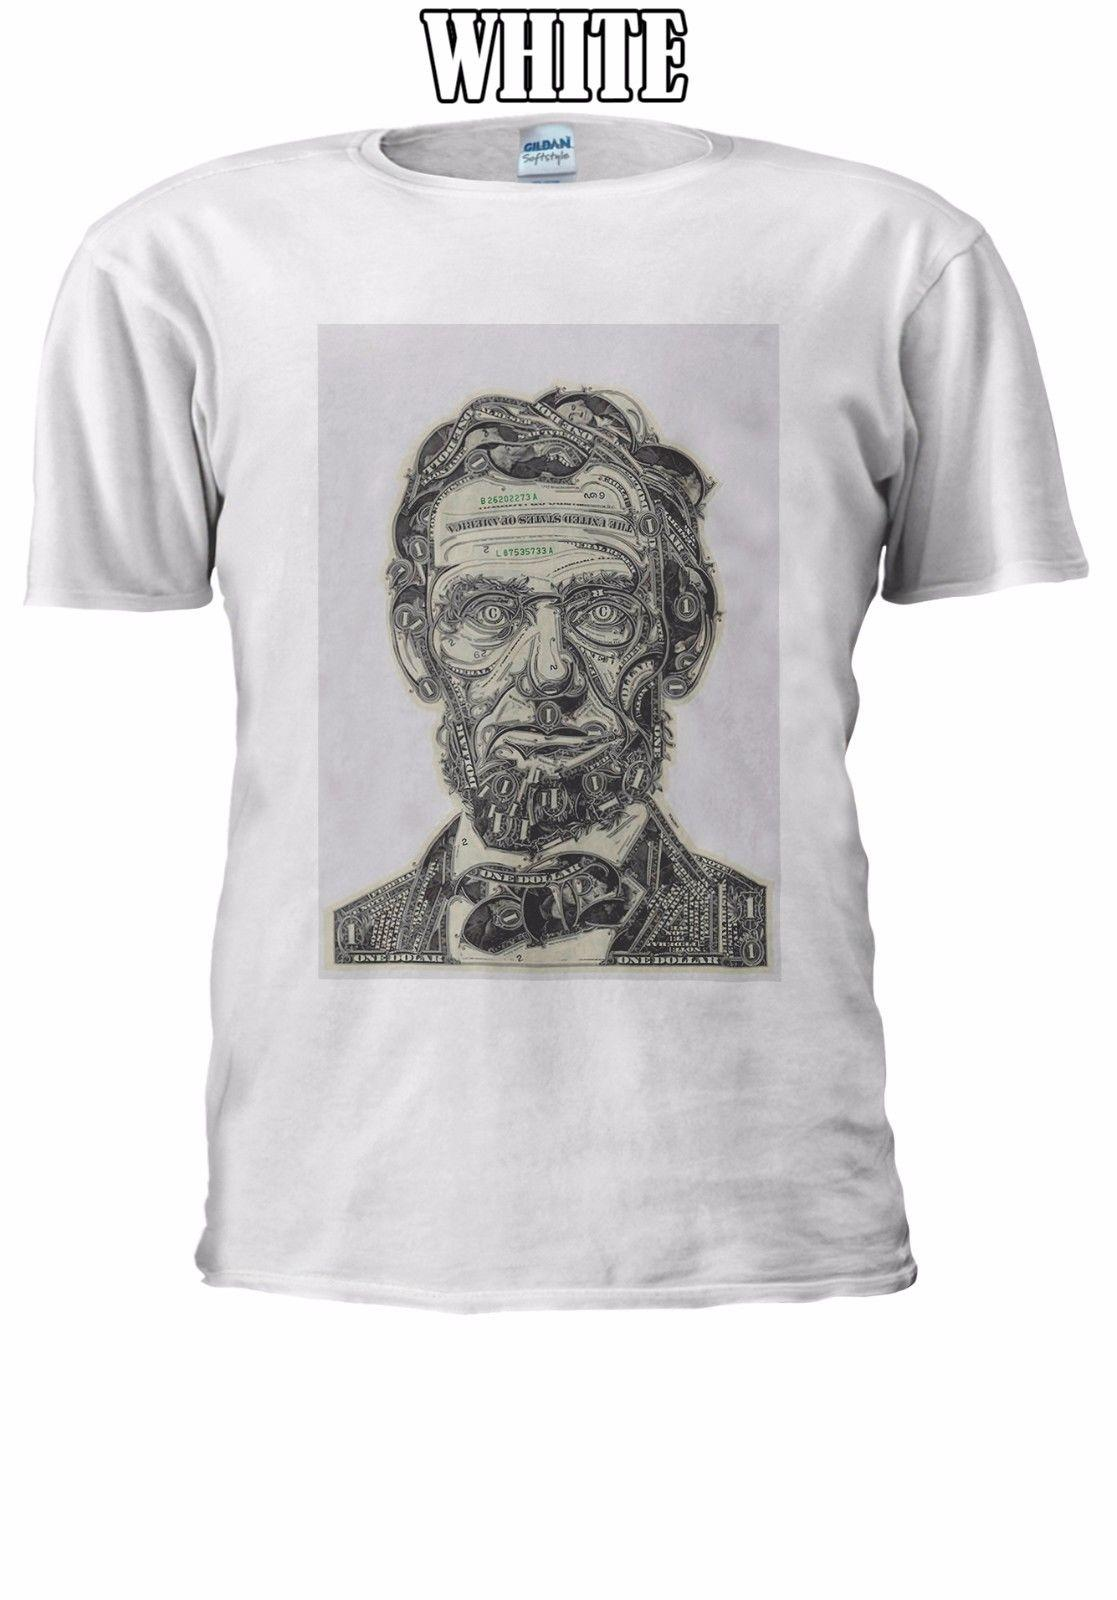 dd65052f7 Abraham Lincoln Dollar Face Tumblr T-shirt Vest Tank Top Men Women Unisex  2608 Cool Casual Pride T Shirt Men Unisex New Abraham Lincoln Cheep T  Shirts T- ...